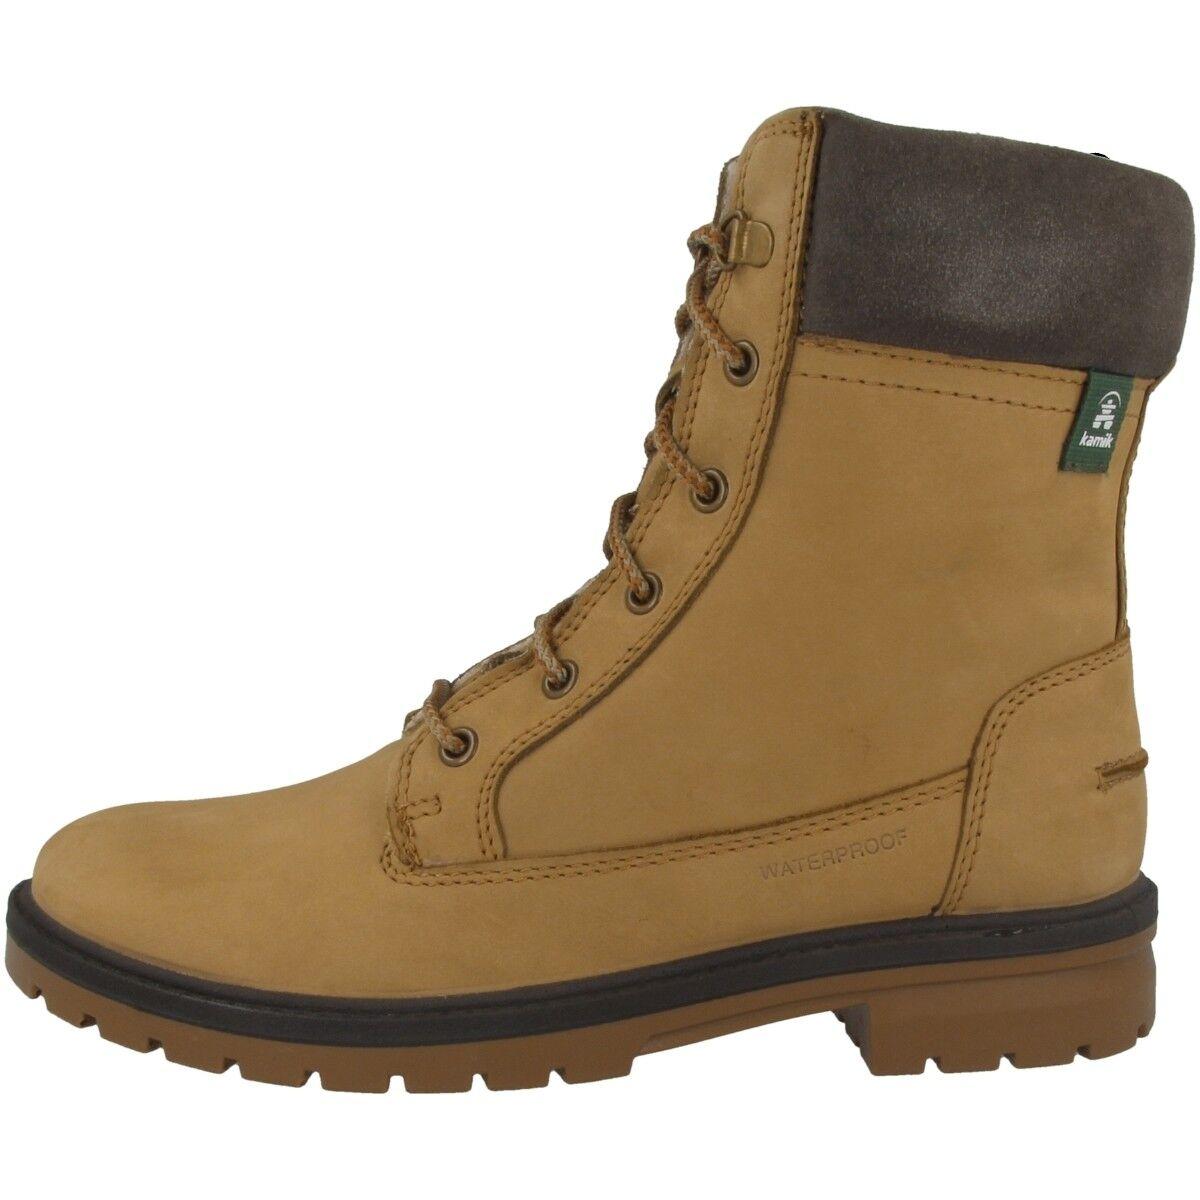 Kamik Rogue6 damen Damen Stiefel Schuhe Stiefel Stiefeletten honey WK2401-HON